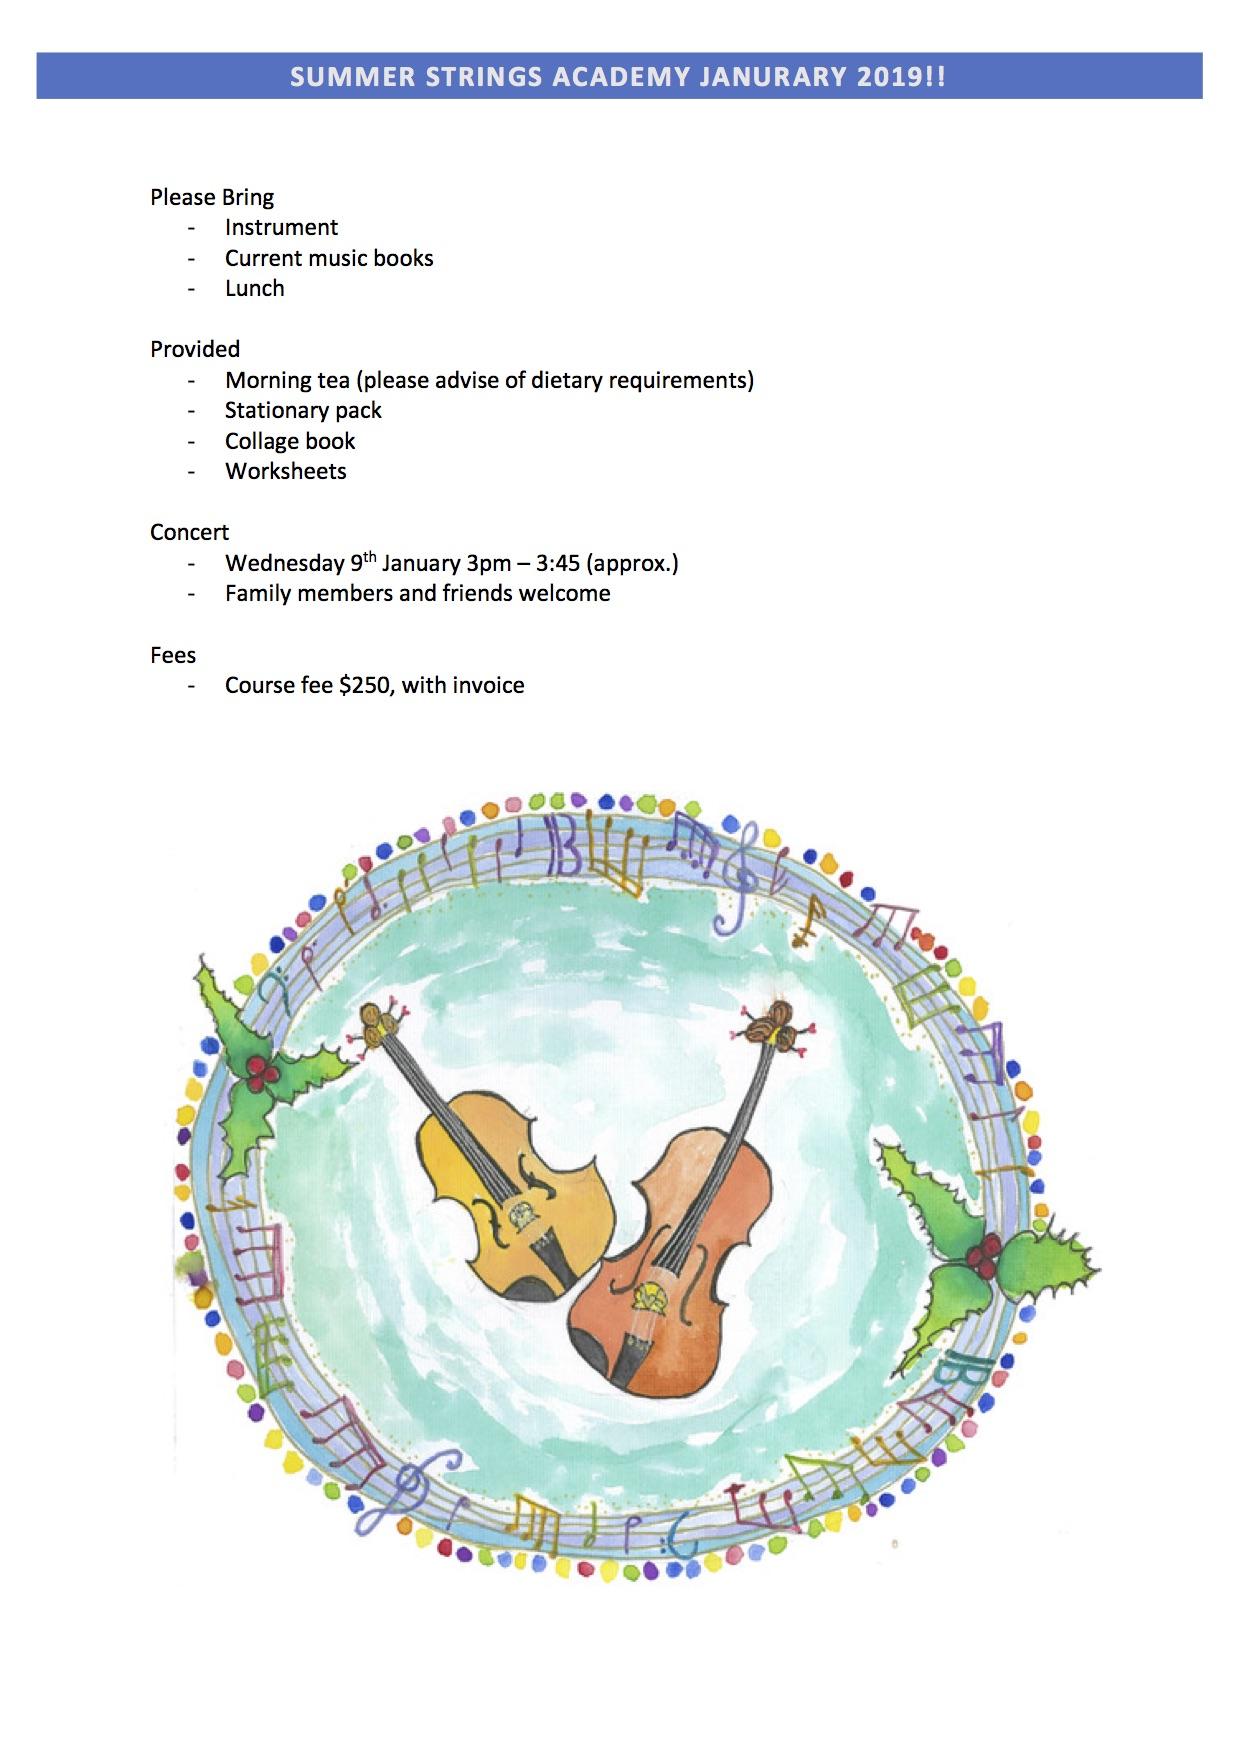 Summer Strings Academy January 2019 p2.jpg